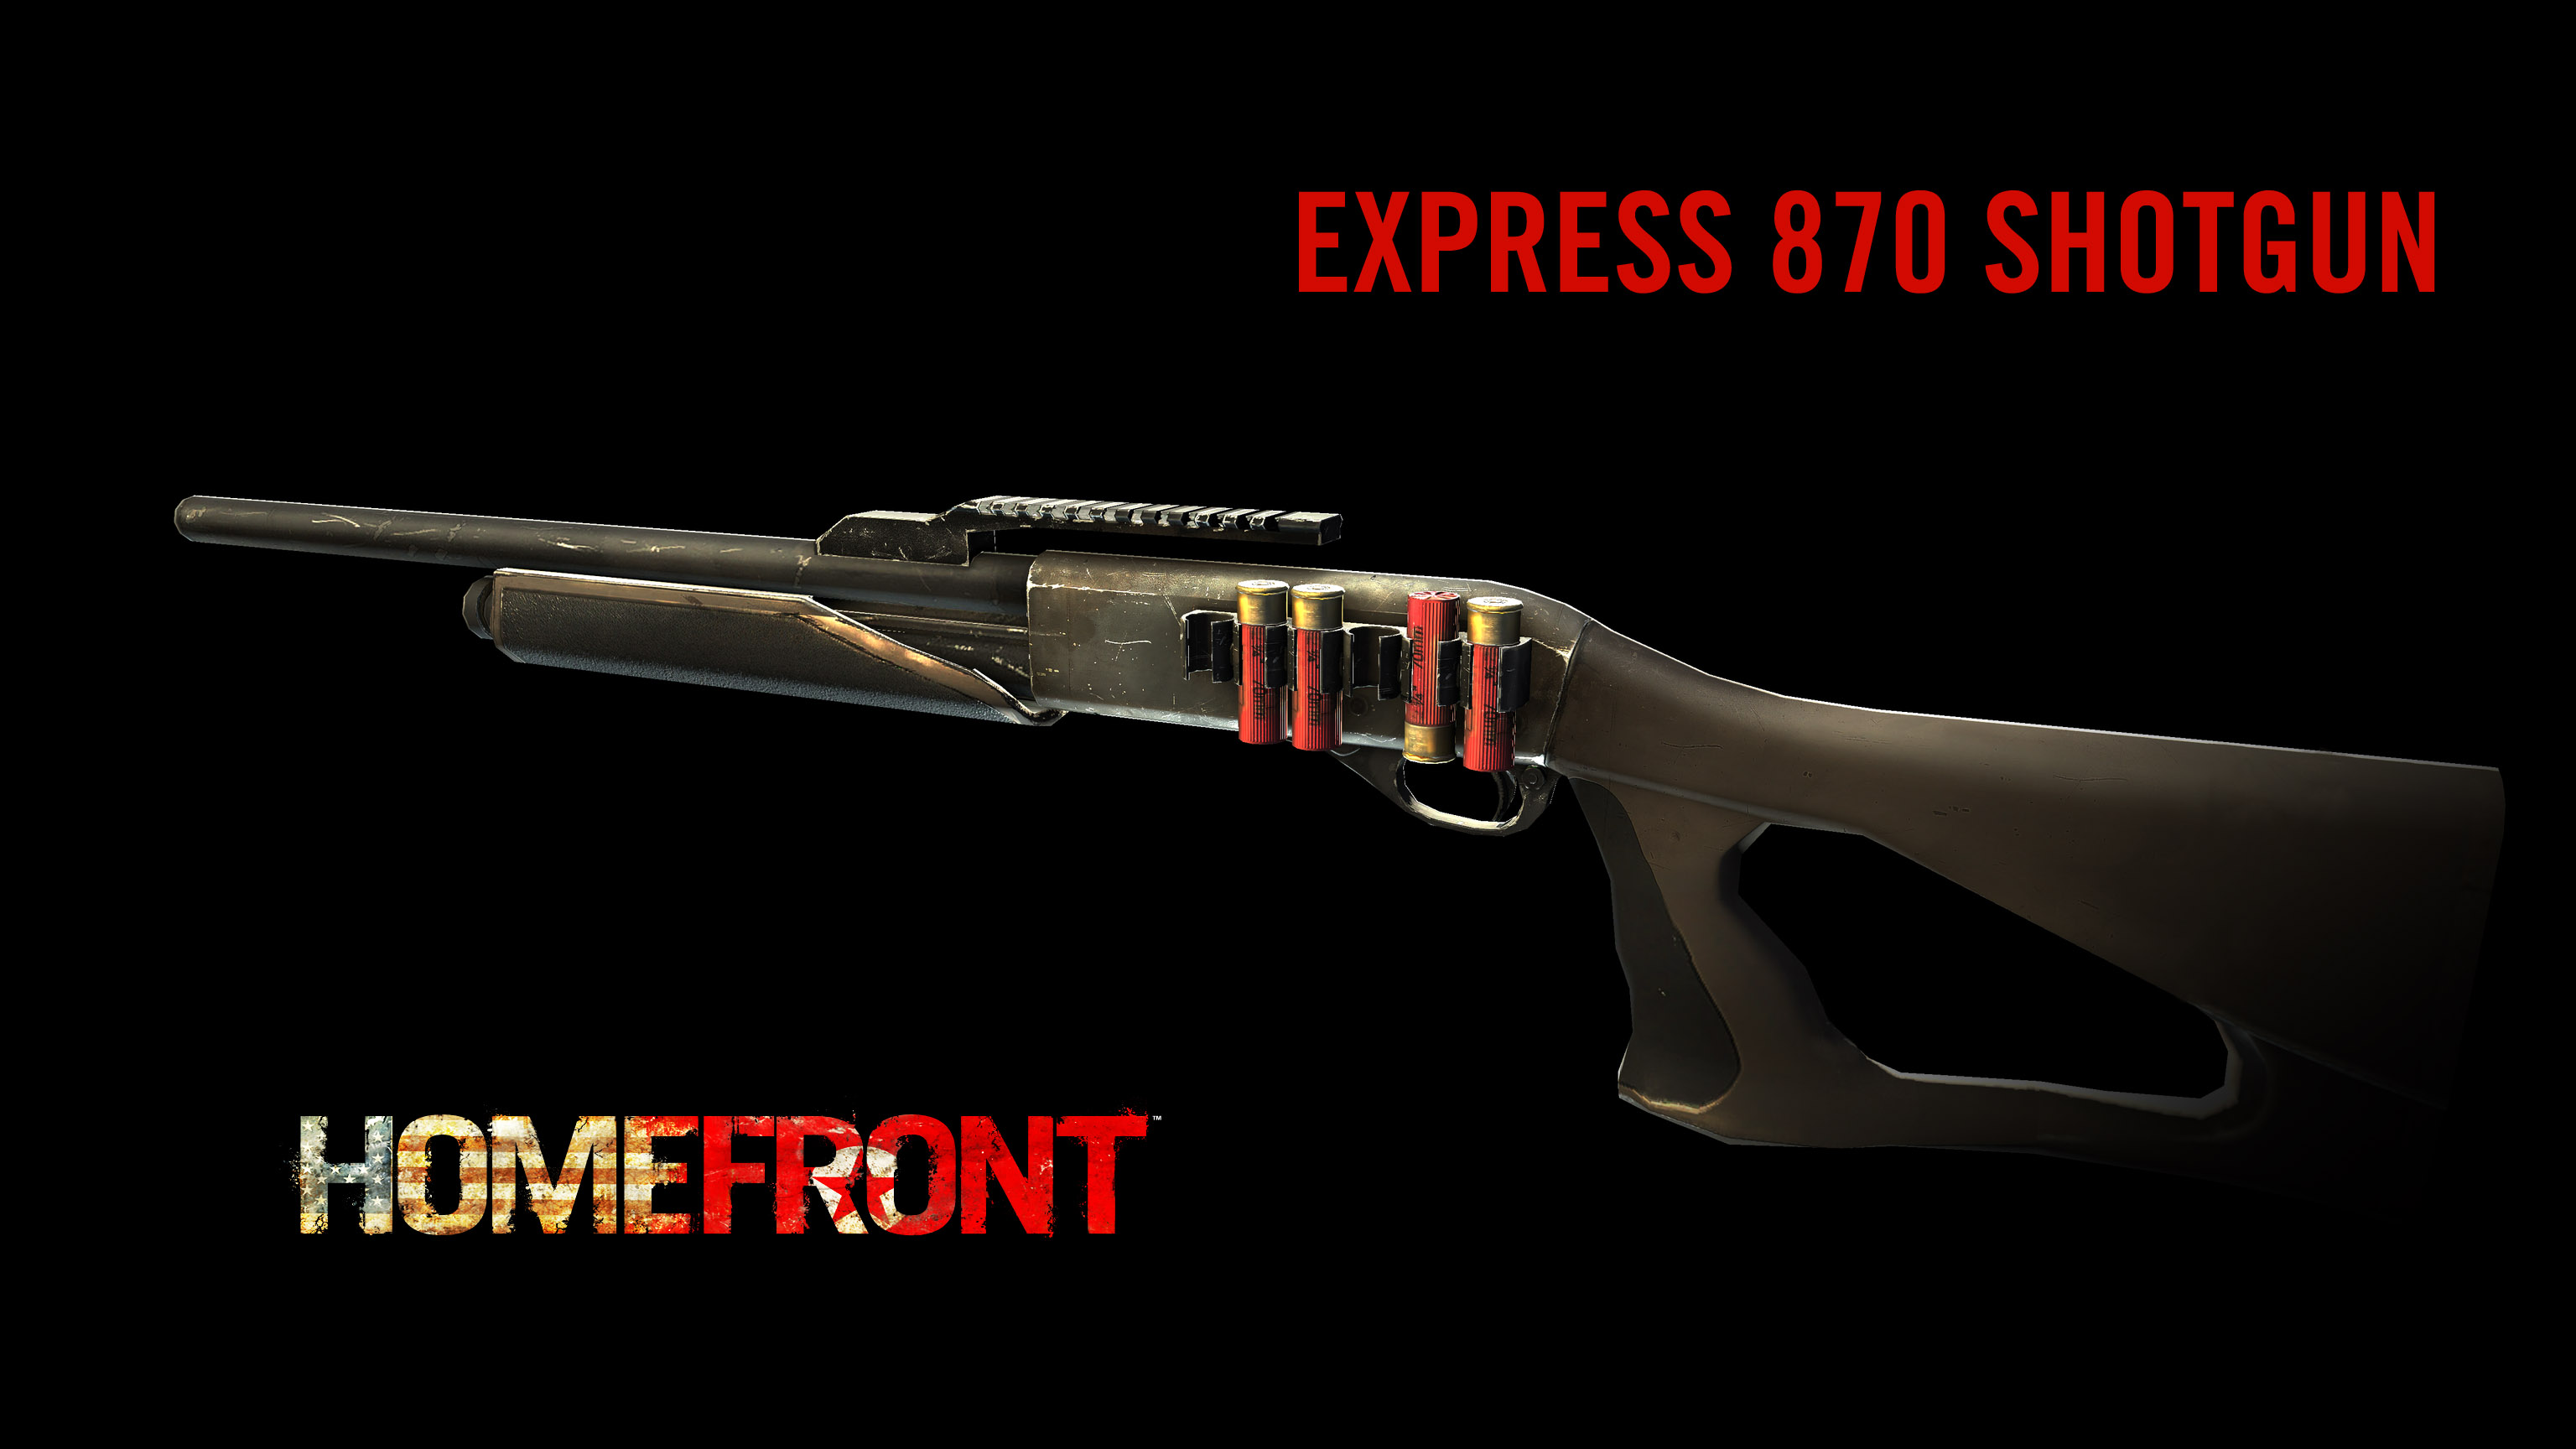 Homefront: Express 870 Shotgun screenshot